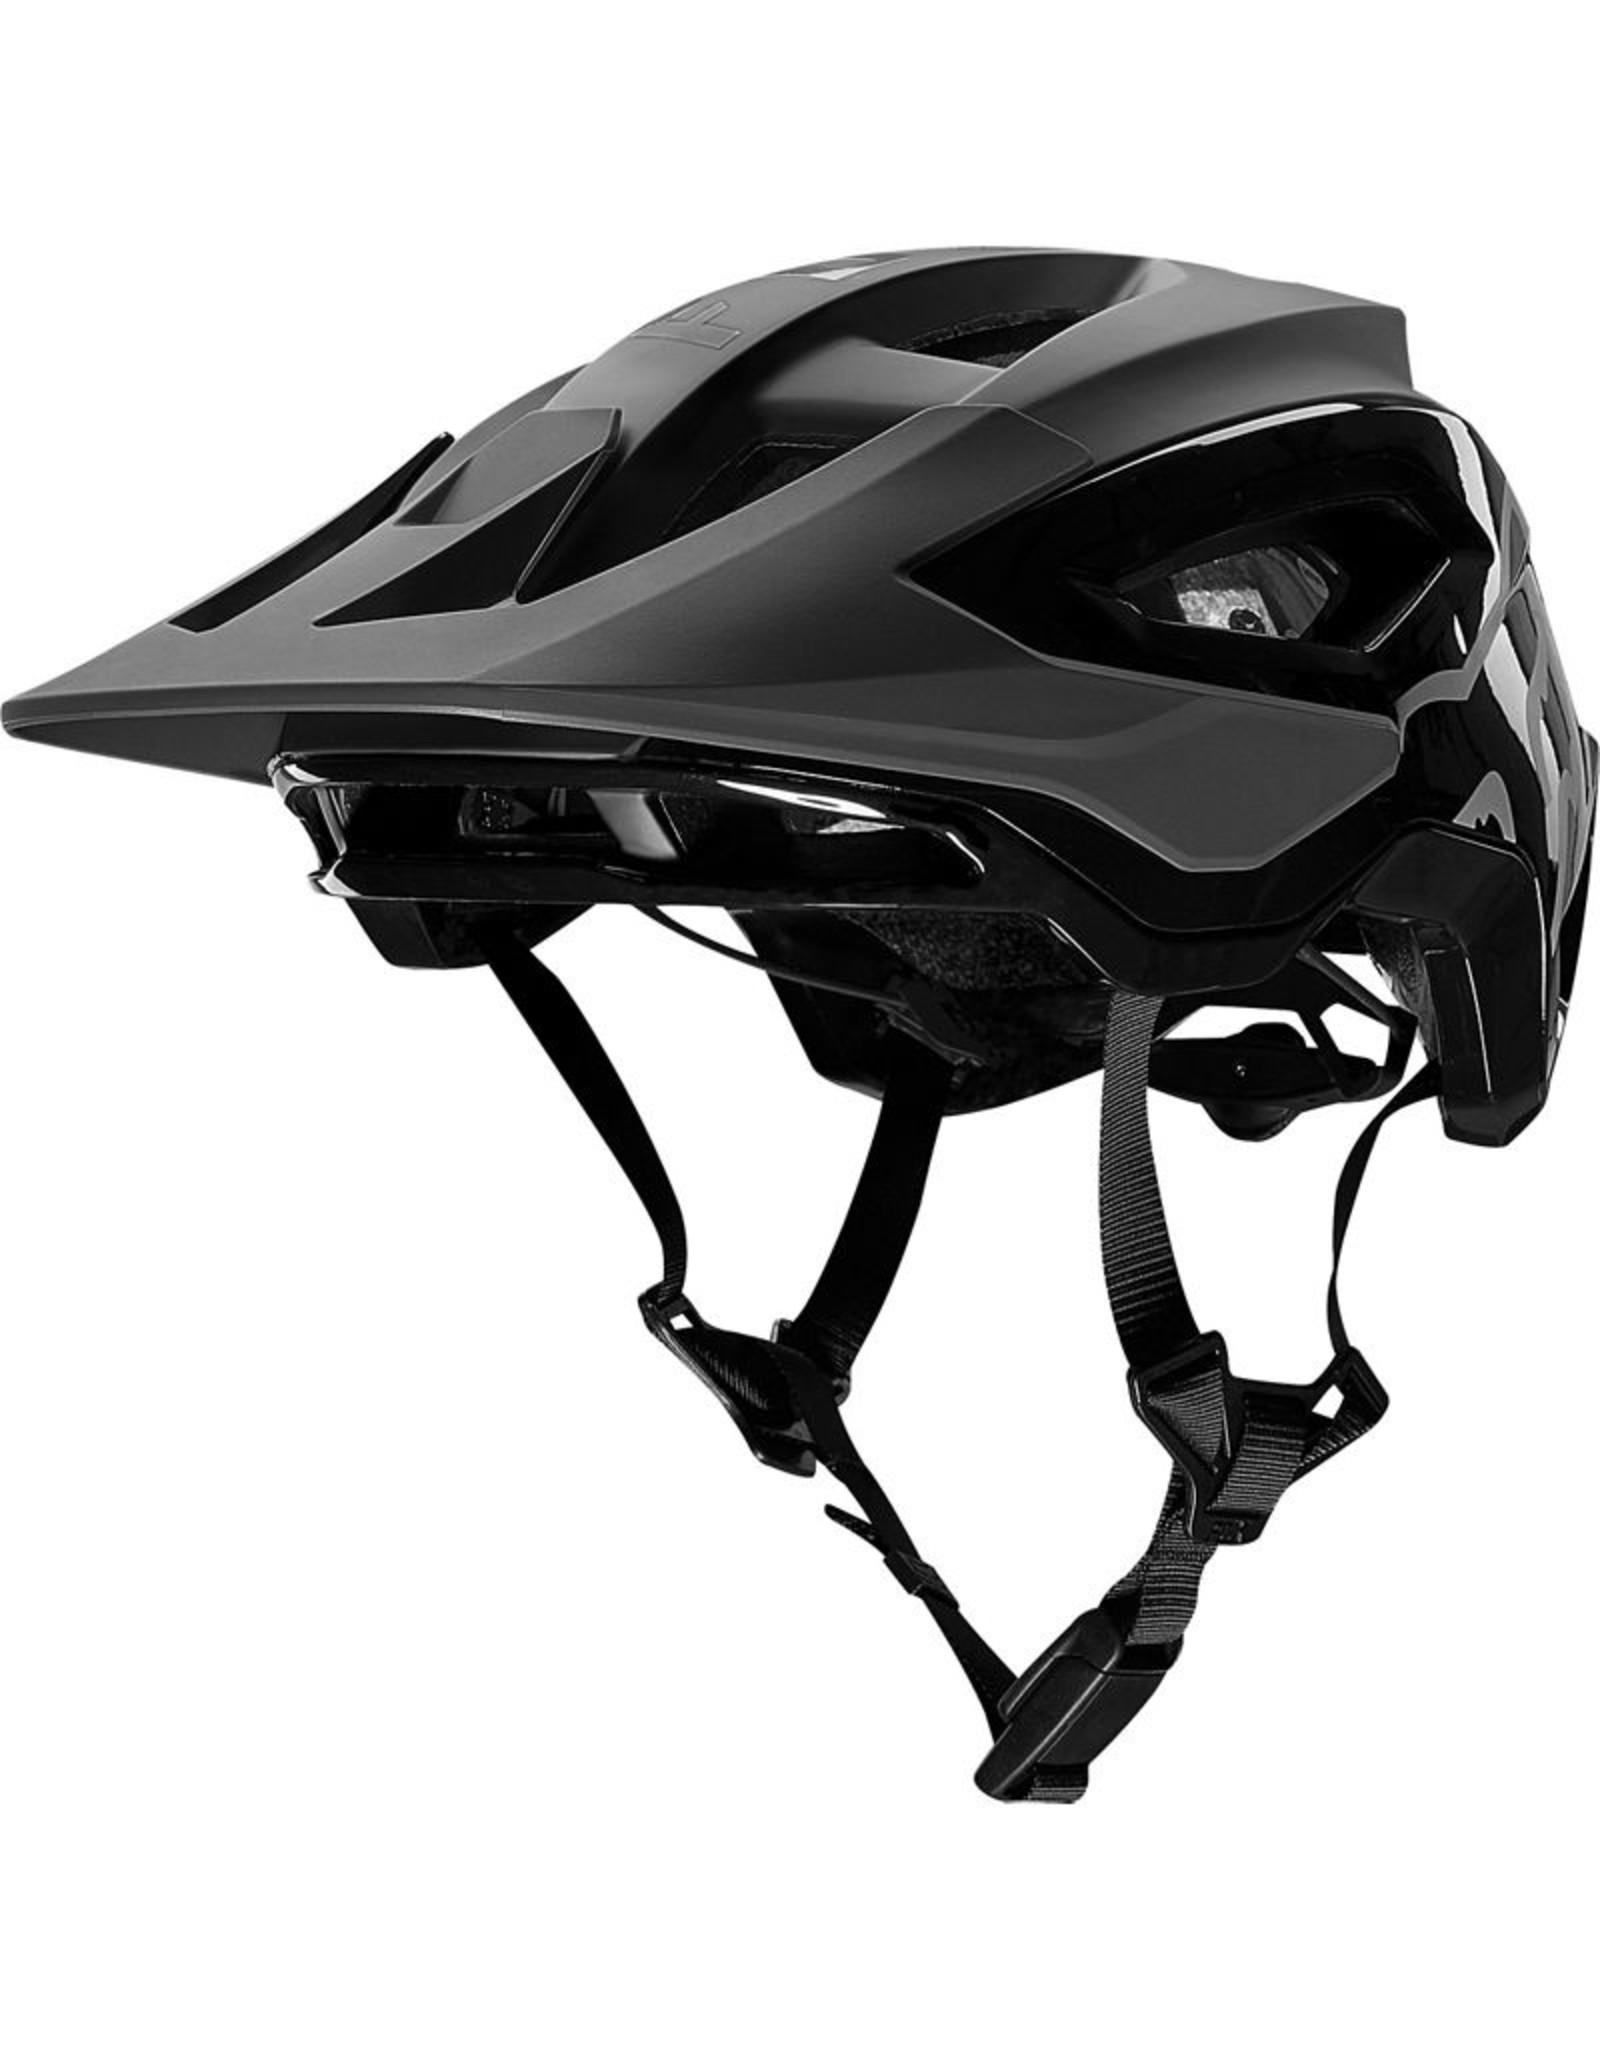 FOX HEAD CLOTHING Fox Speedframe PRO Helmet